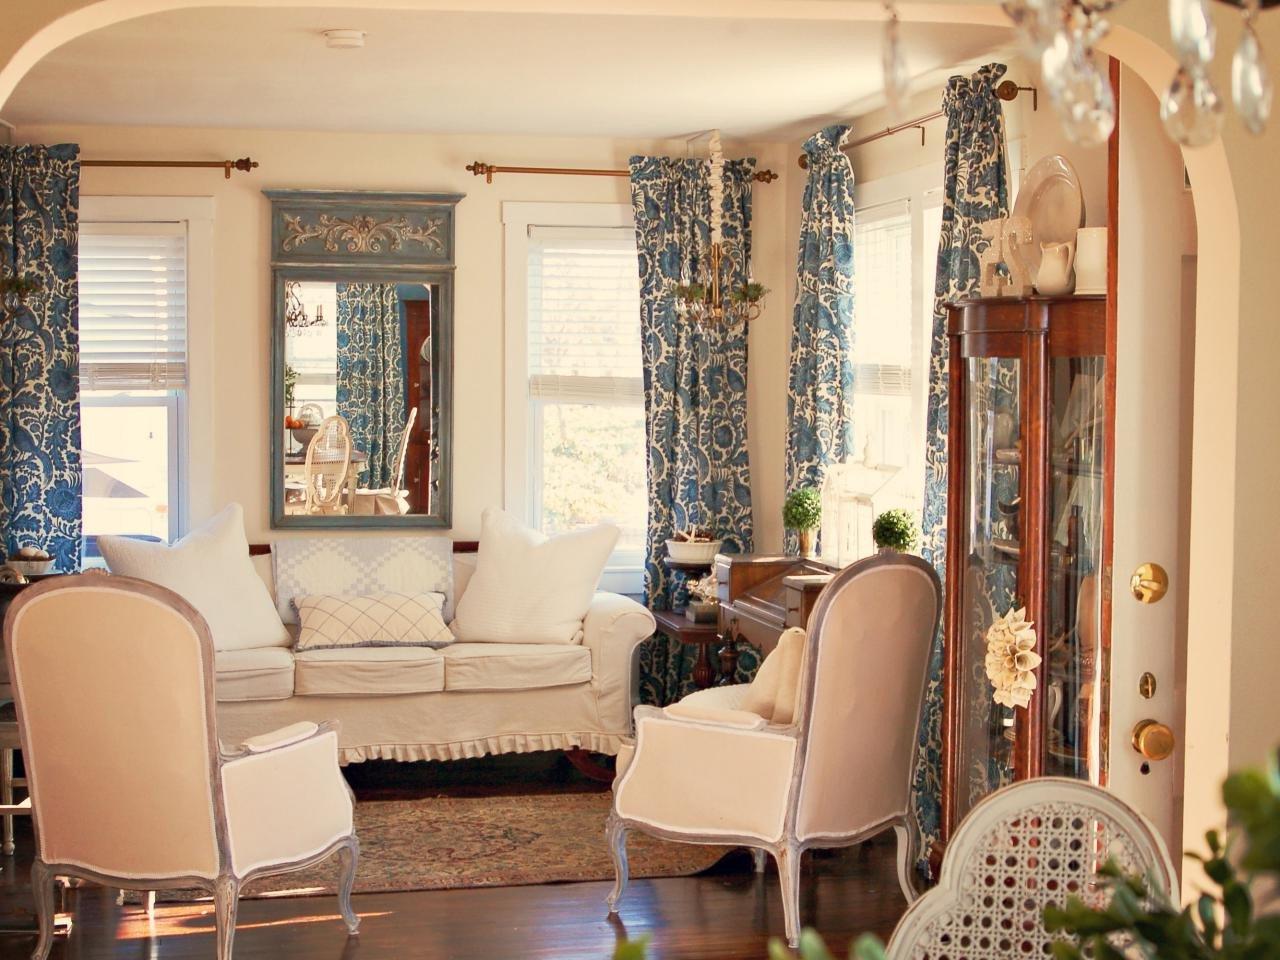 Paris Themed Living Room Decor Ideas